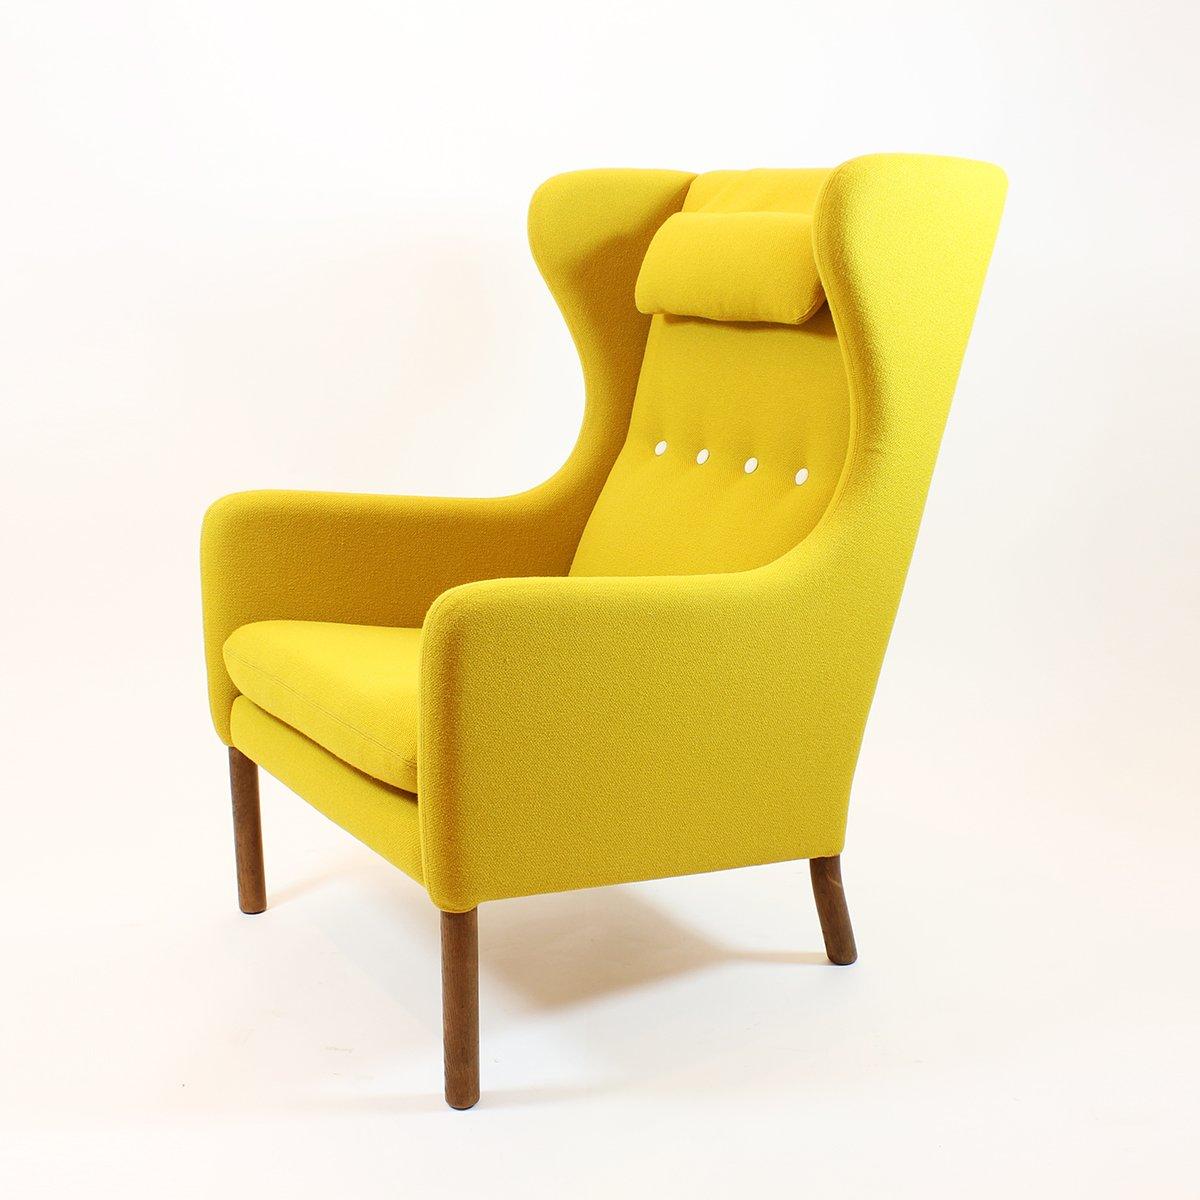 gelber skandinavischer mid century sessel bei pamono kaufen. Black Bedroom Furniture Sets. Home Design Ideas